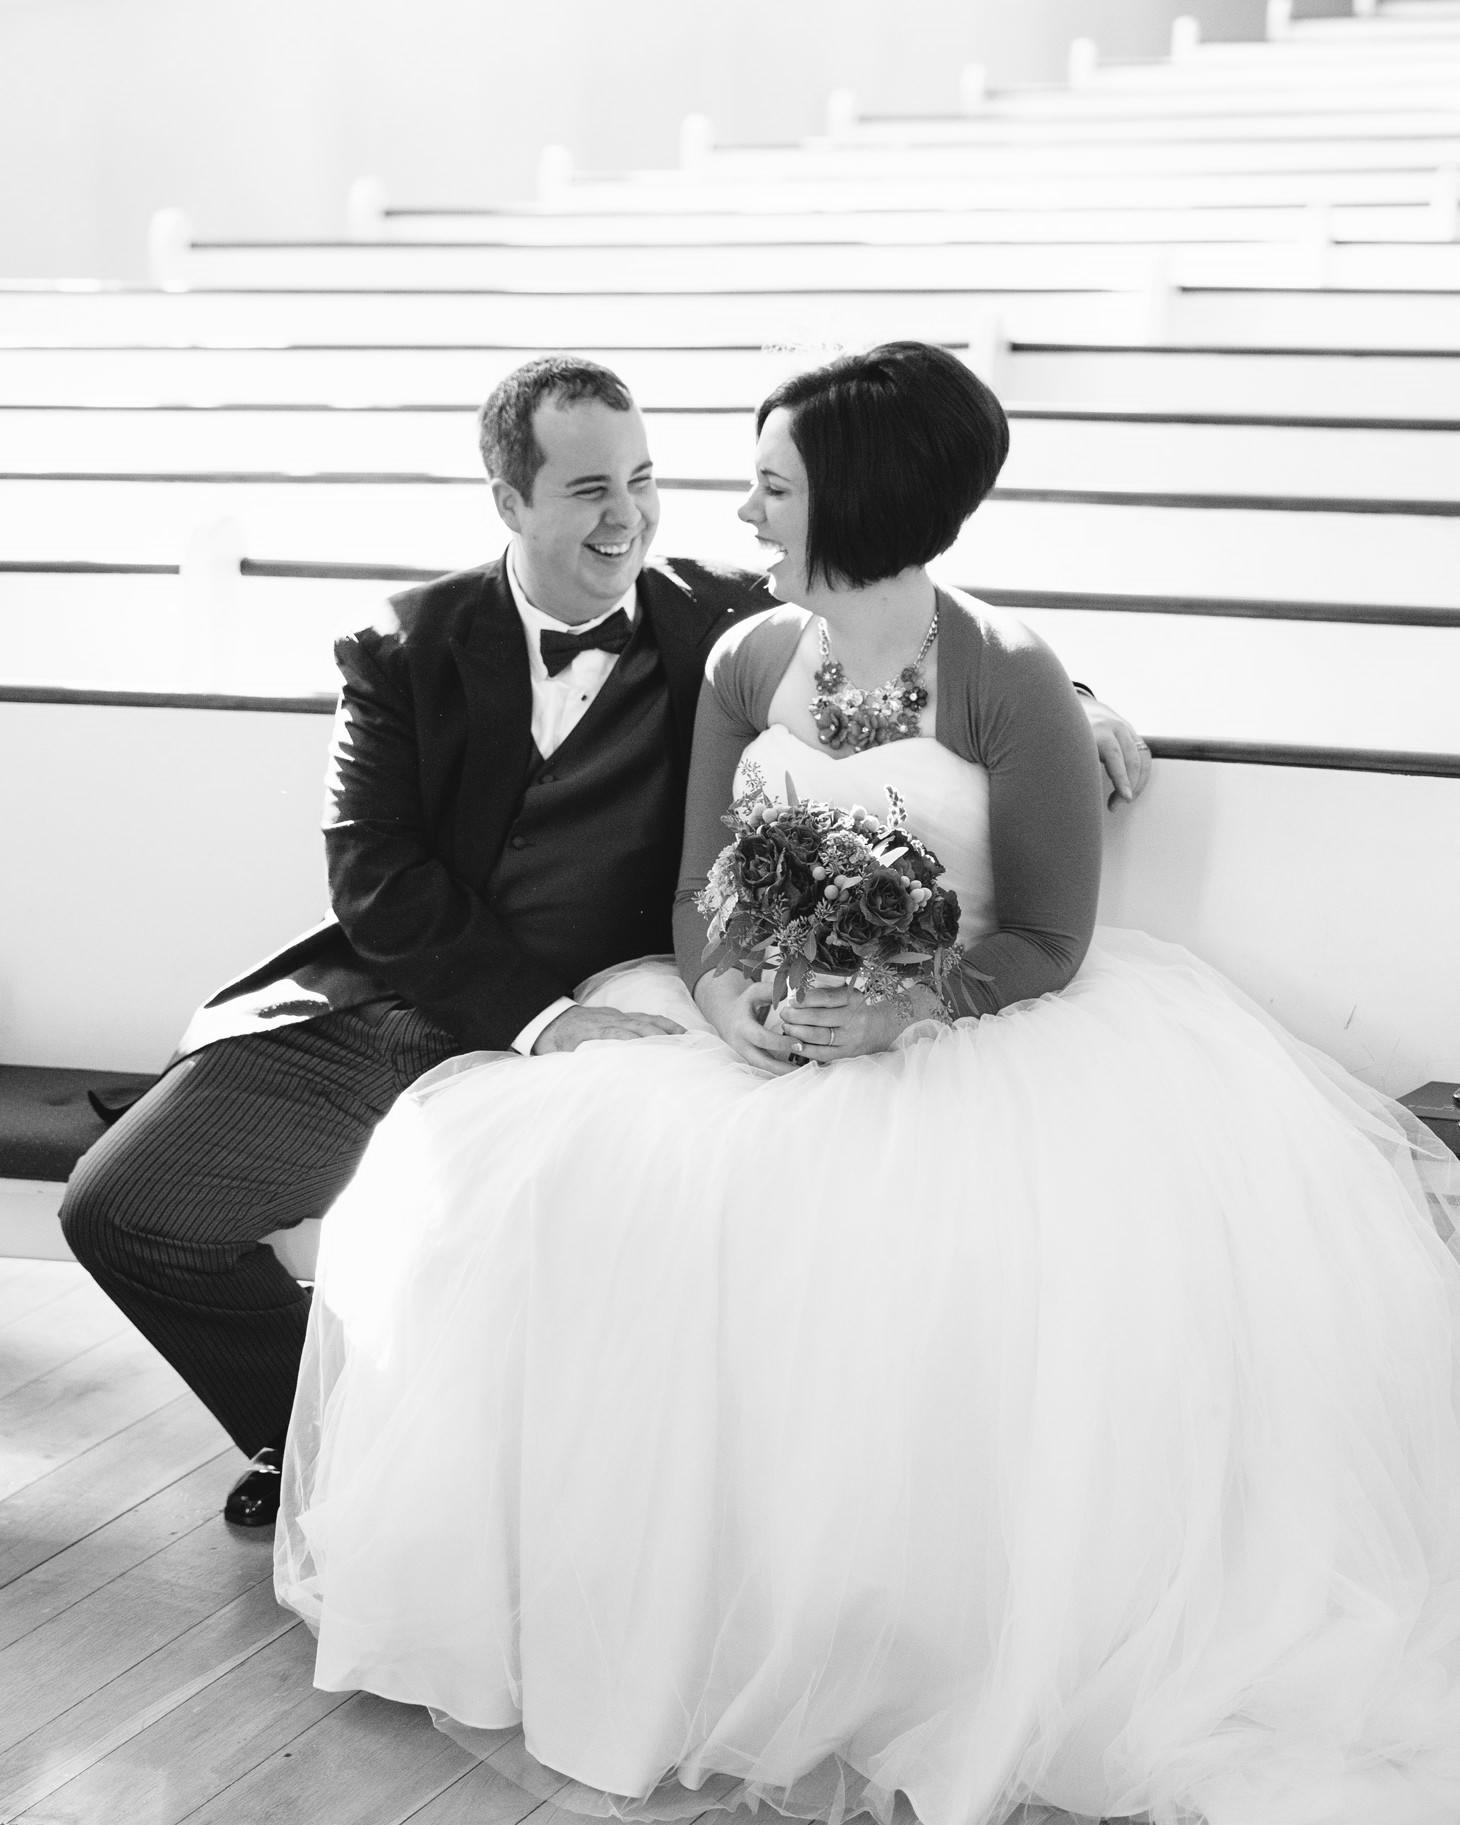 026-nyc-wedding-photographer-smitten-chickens-nj-montclair-art-museum.jpg